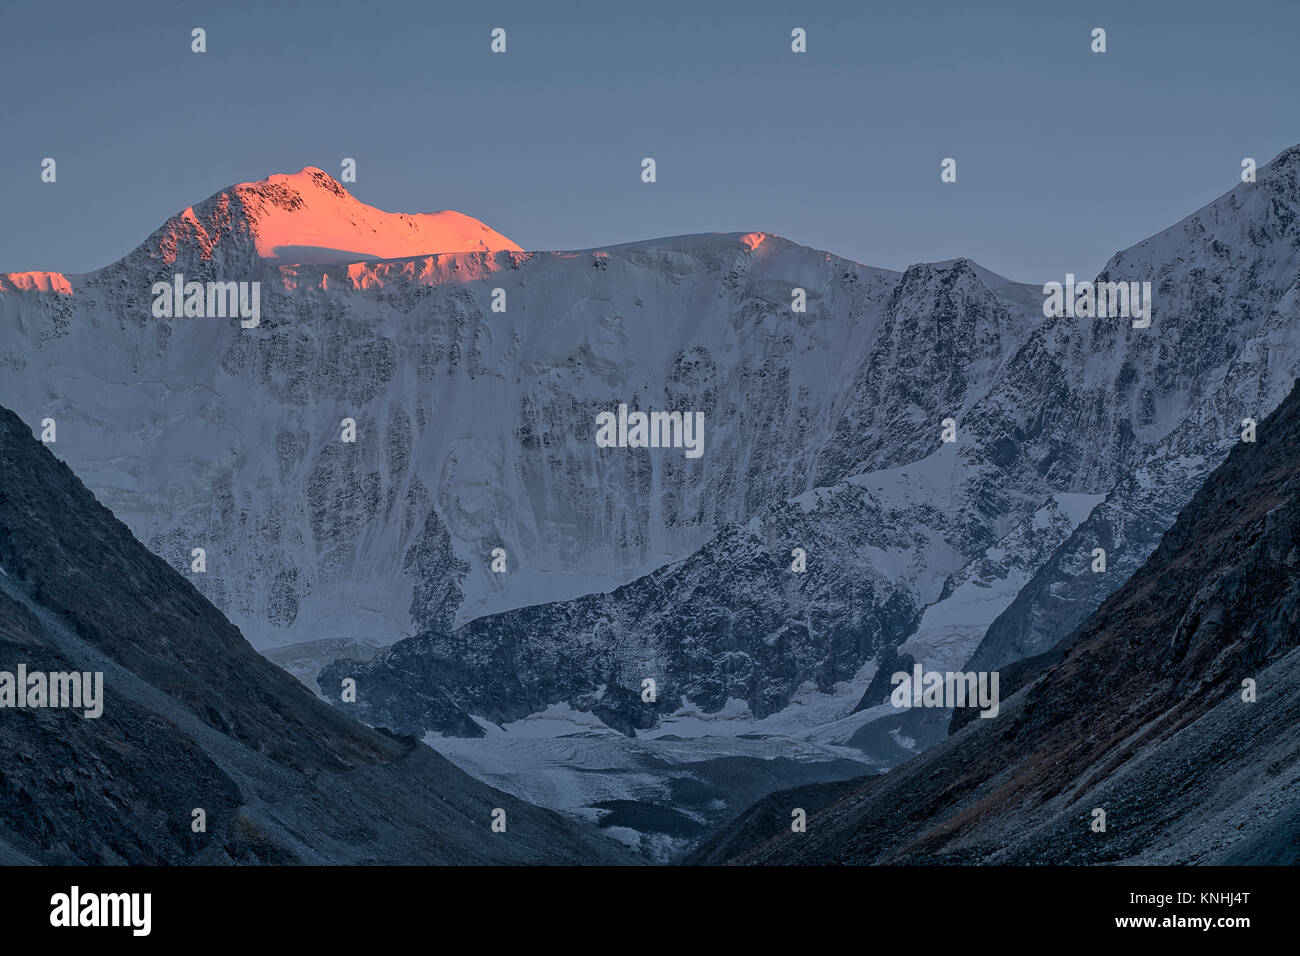 Sunset light in the mountains, Belukha Mountain, Altai - Stock Image